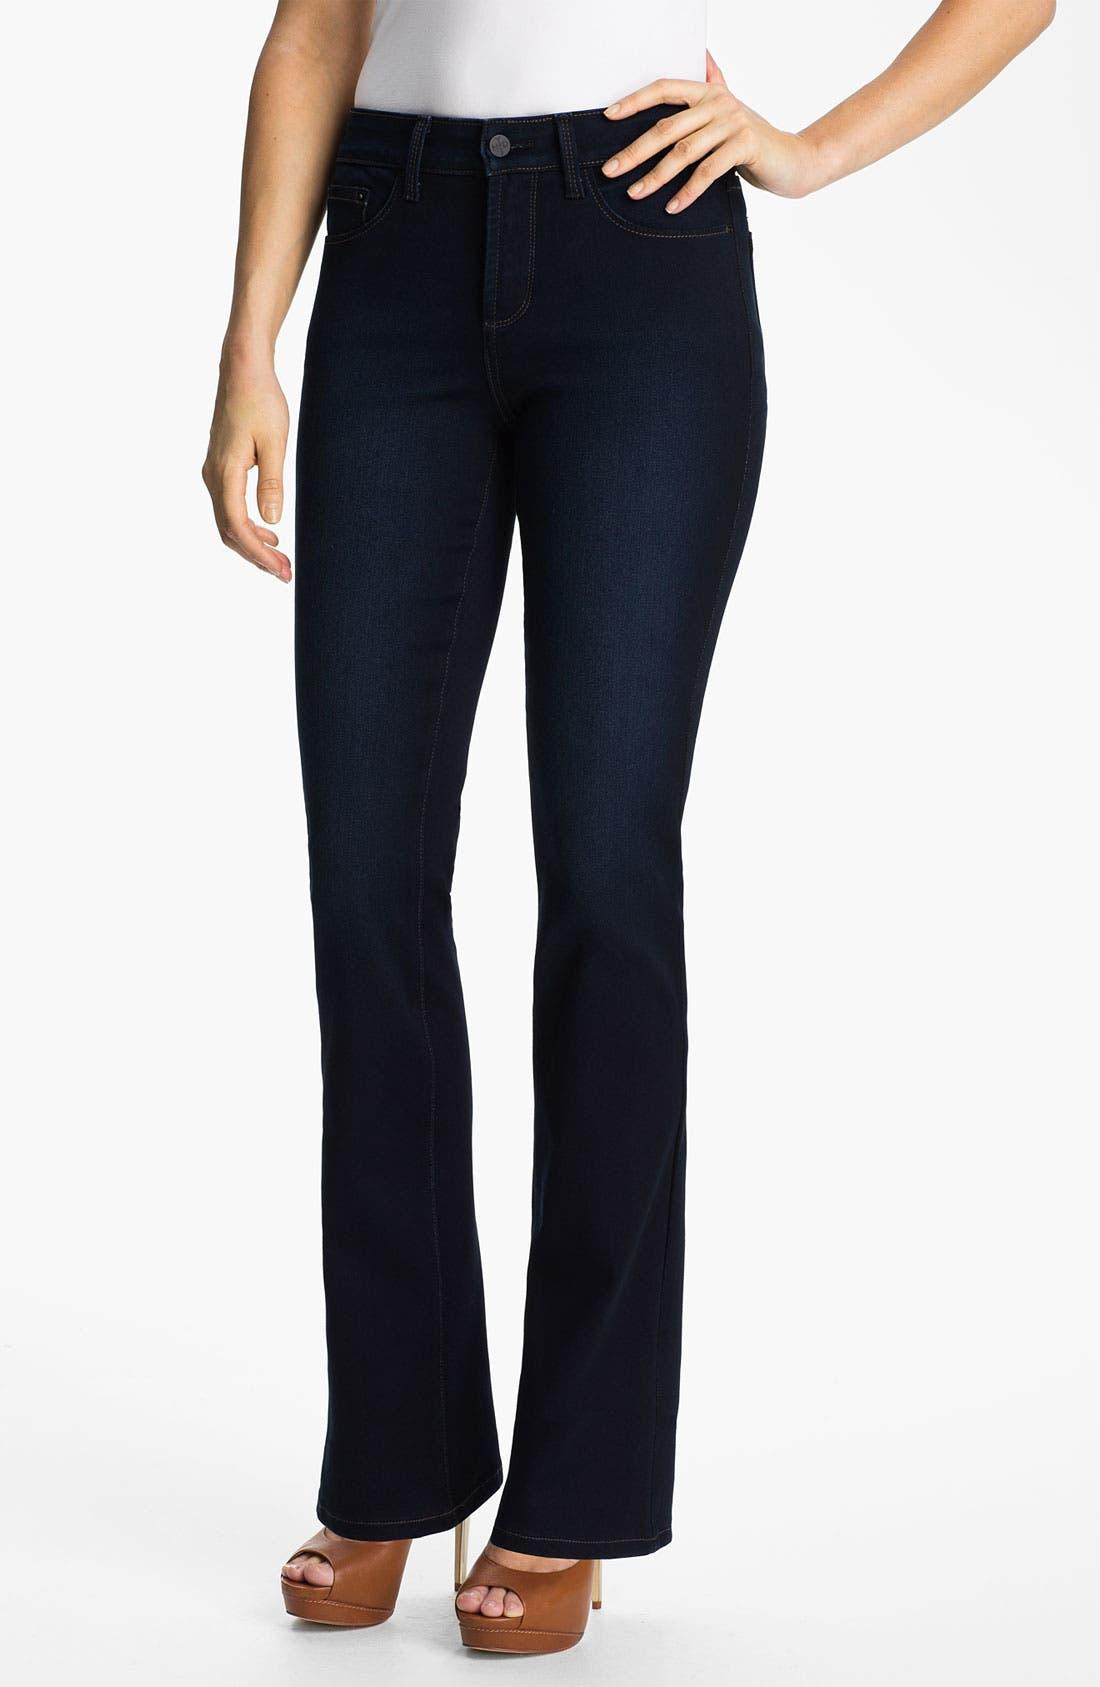 Alternate Image 1 Selected - NYDJ 'Barbara' Bootcut Jeans (Long)